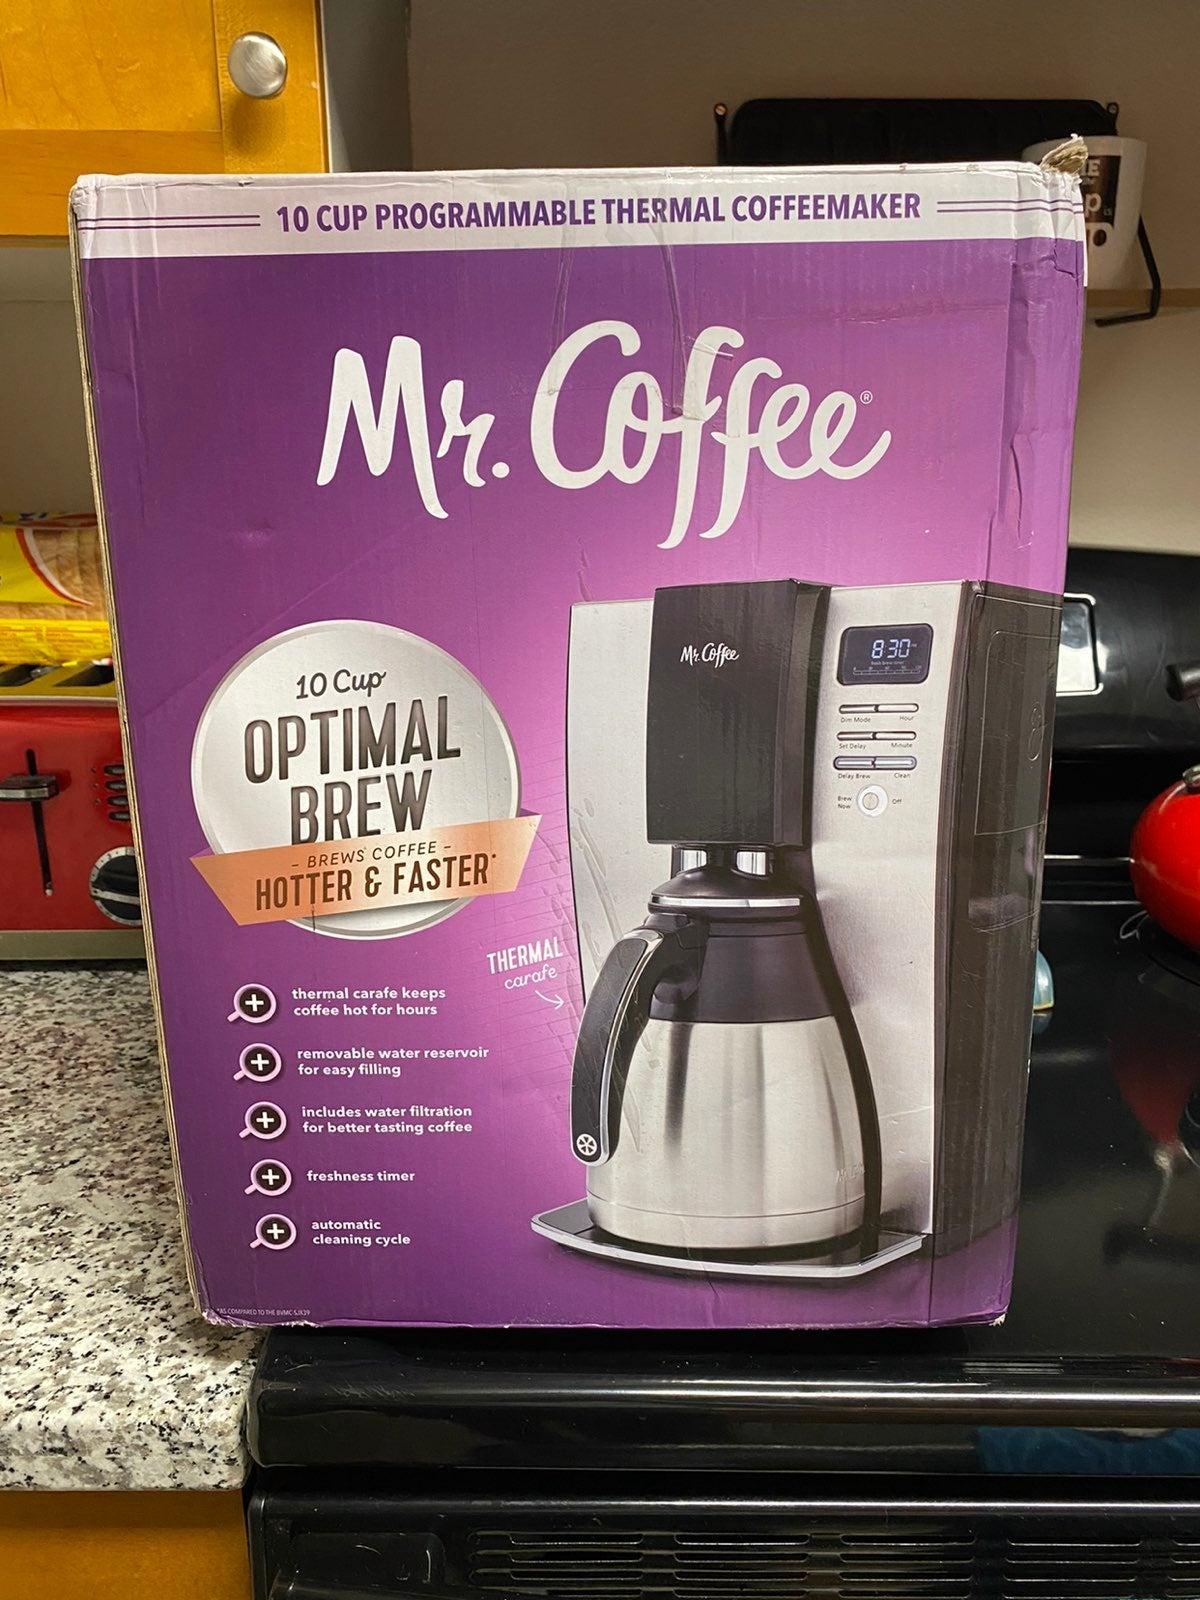 New Mr. Coffee Optimal Brew